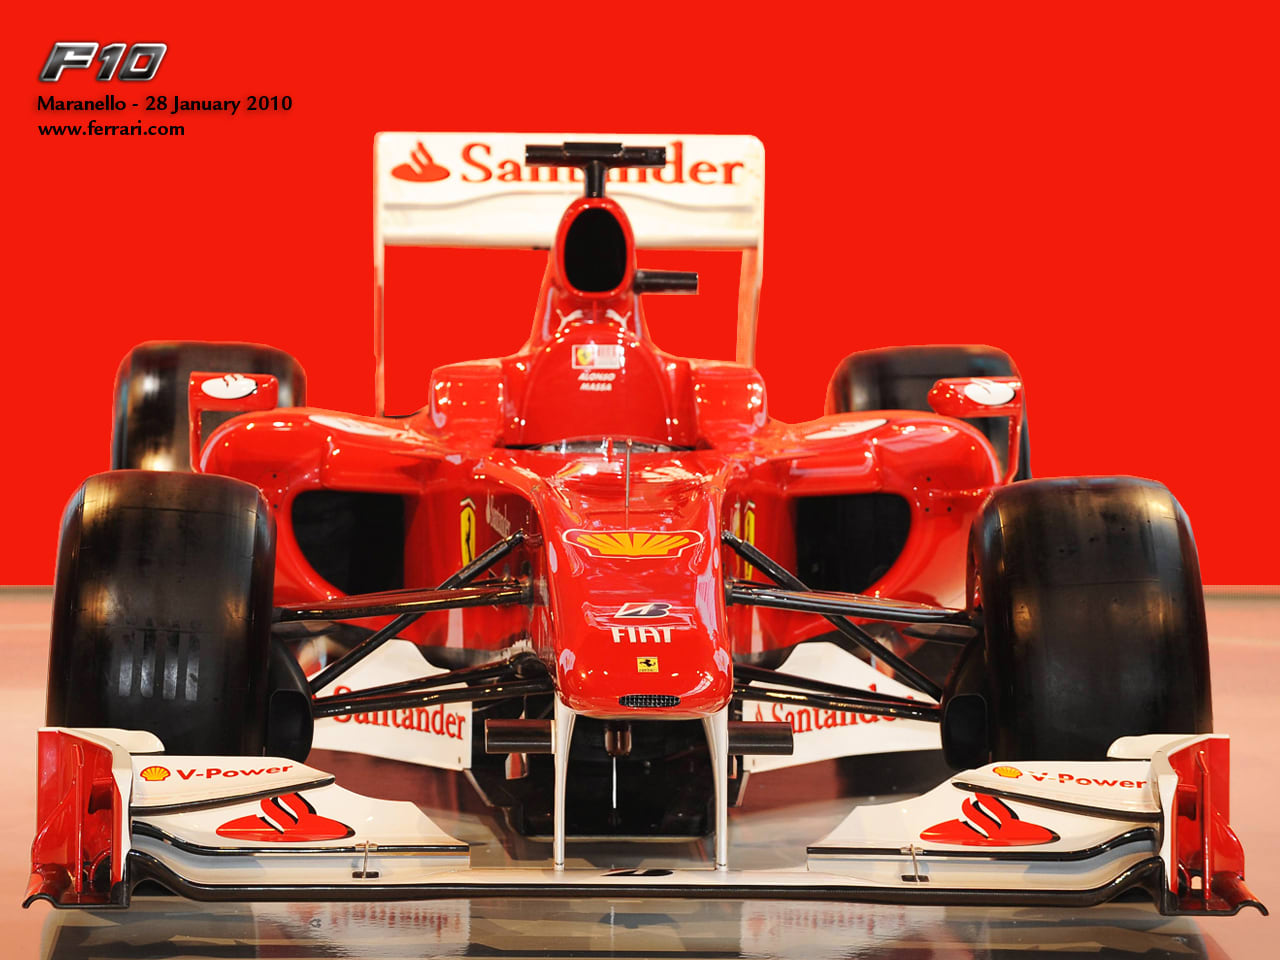 Ferrari F10 Presentation Wallpaper